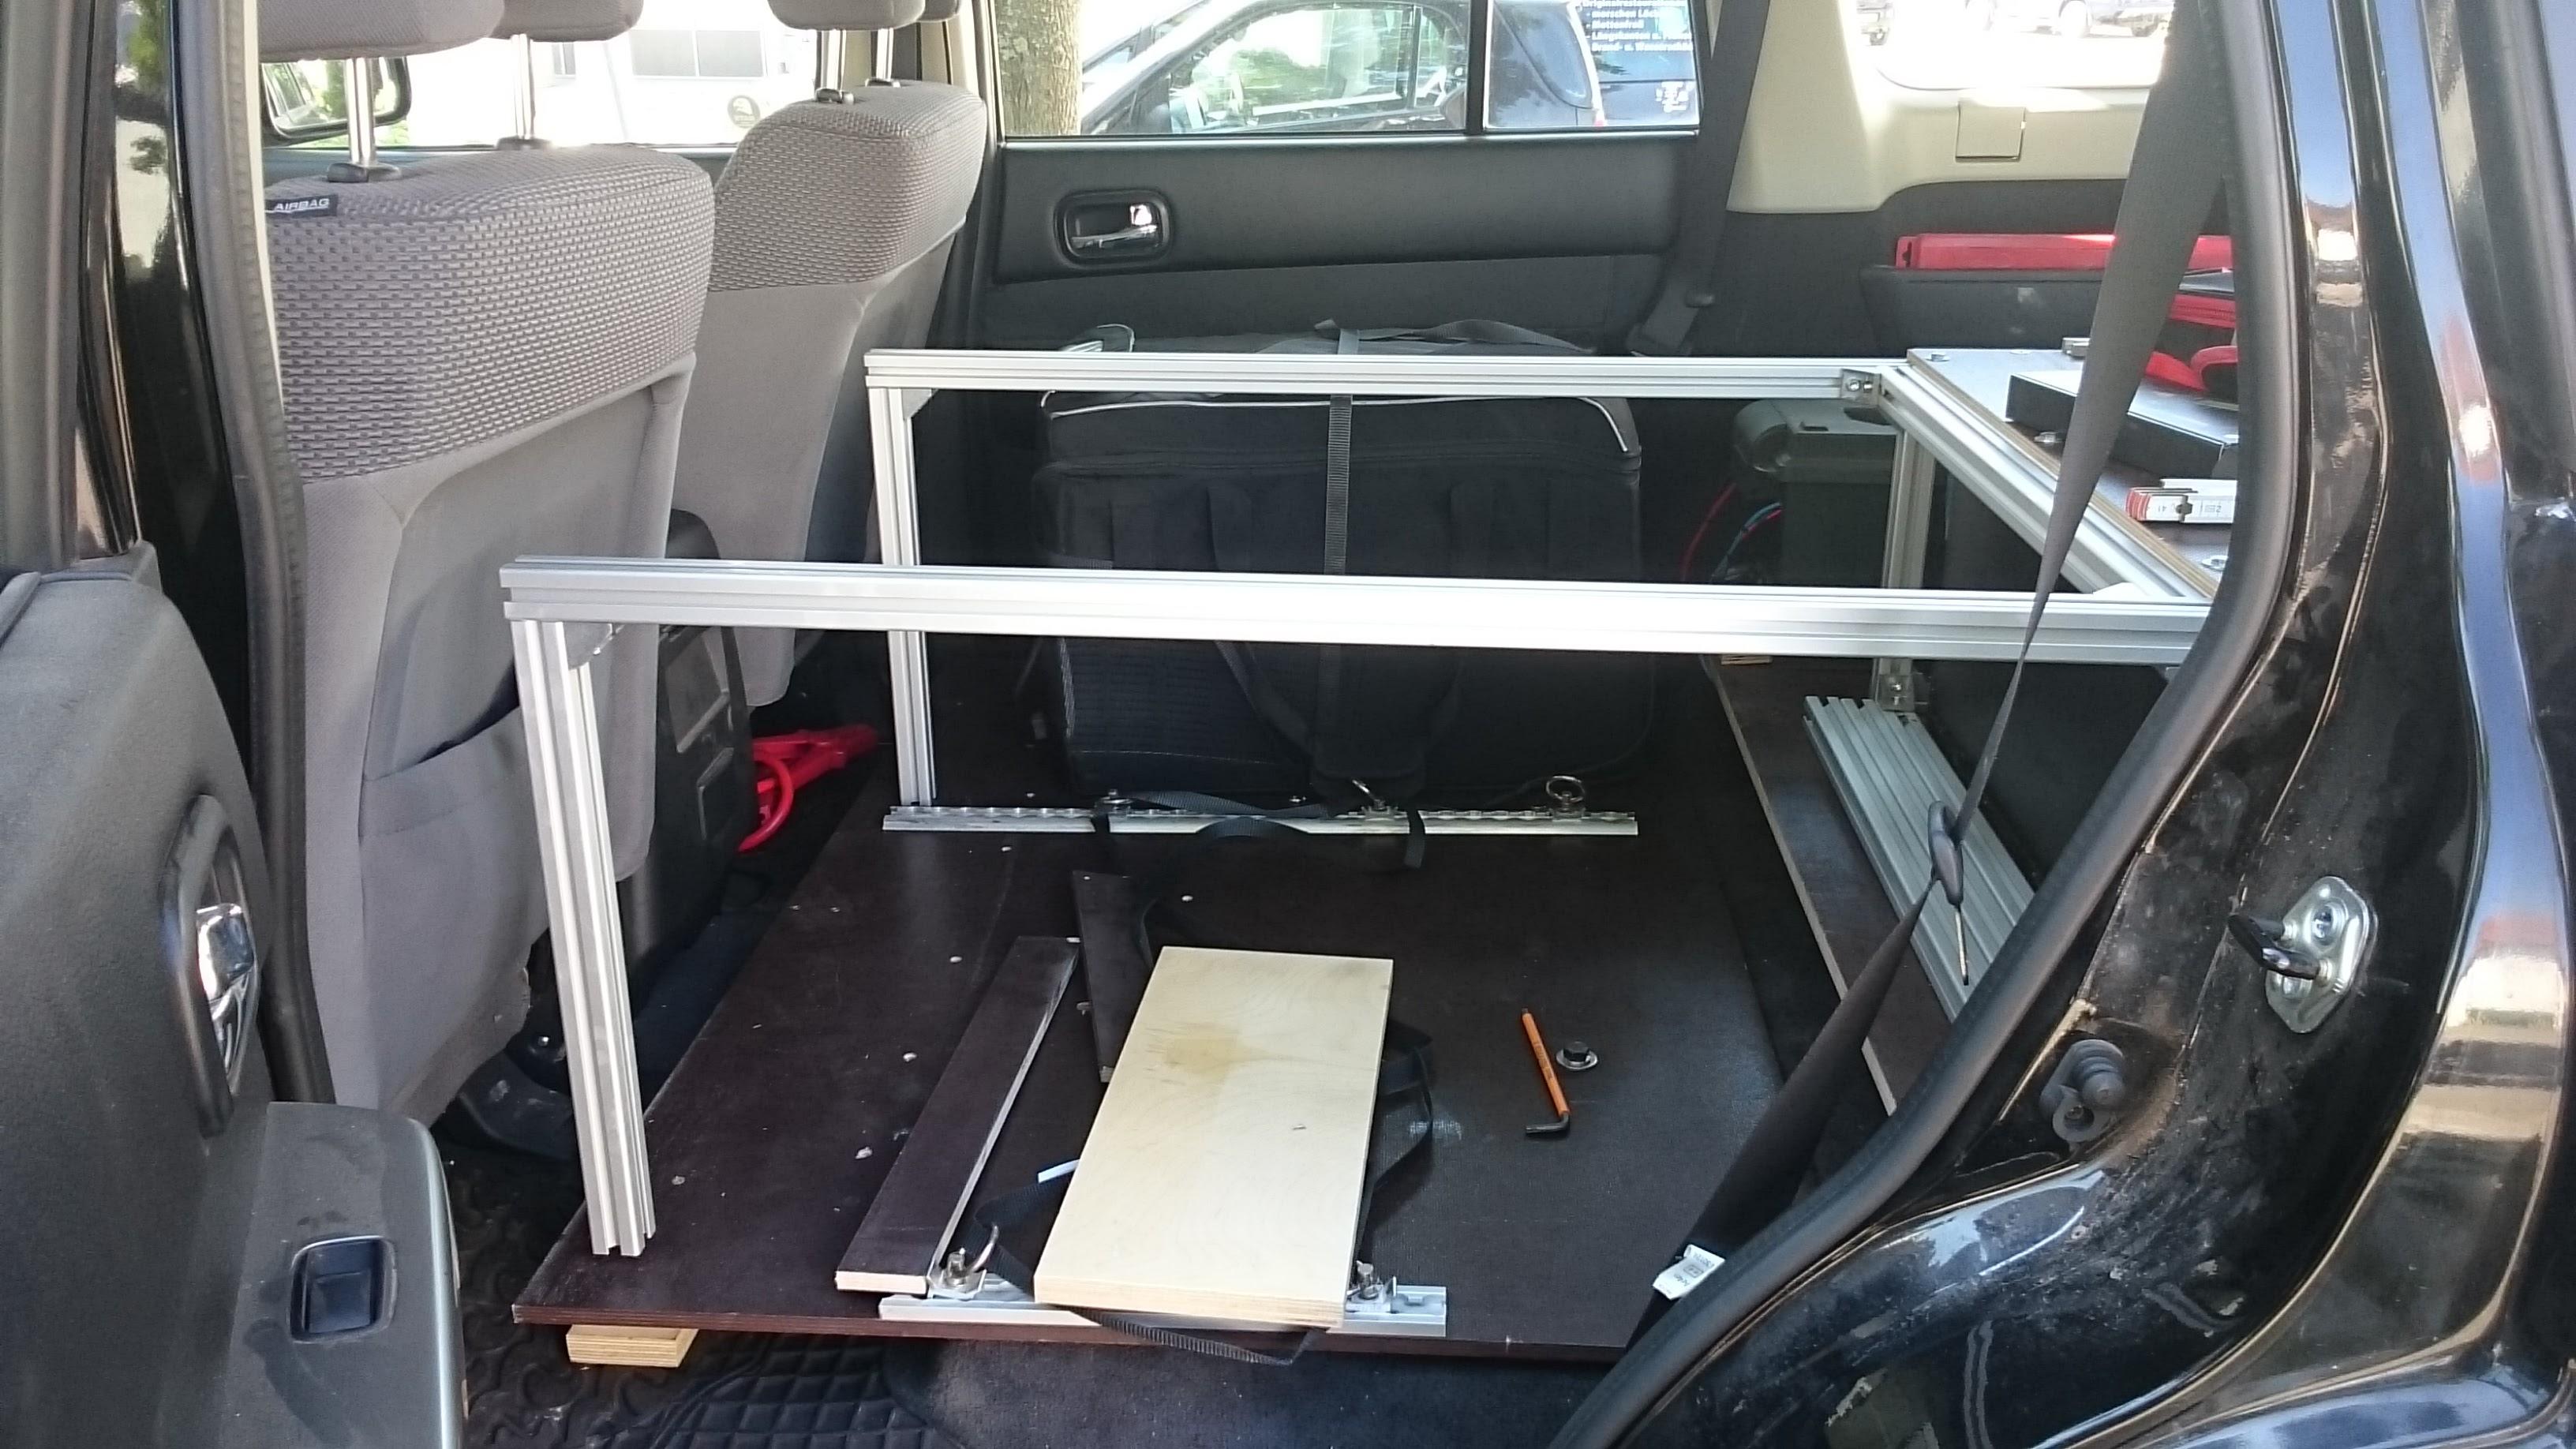 schlafen im auto sgm travel. Black Bedroom Furniture Sets. Home Design Ideas